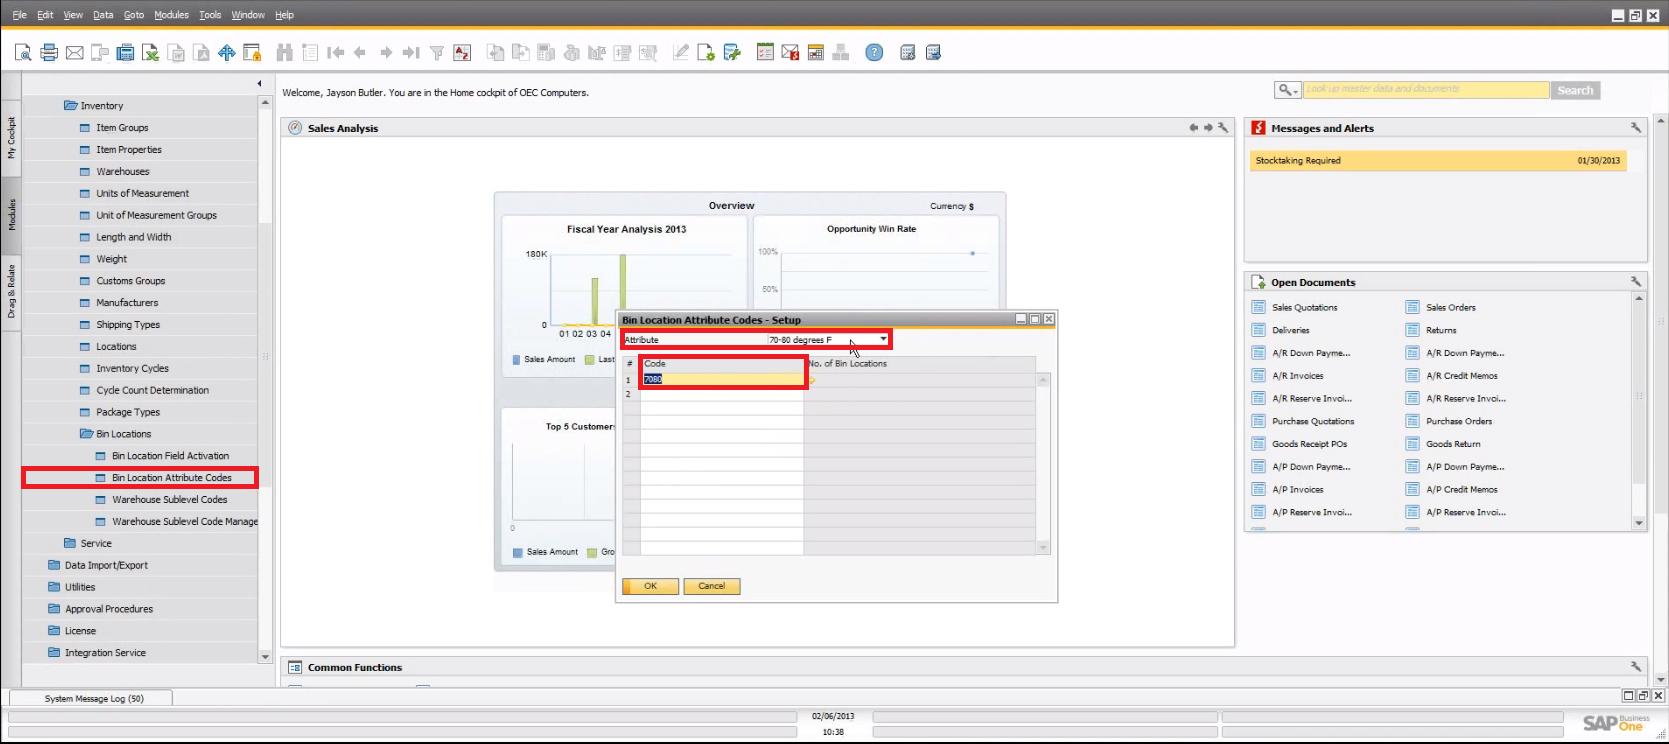 SAP Business One 9.0 Bin Location Attribute Codes